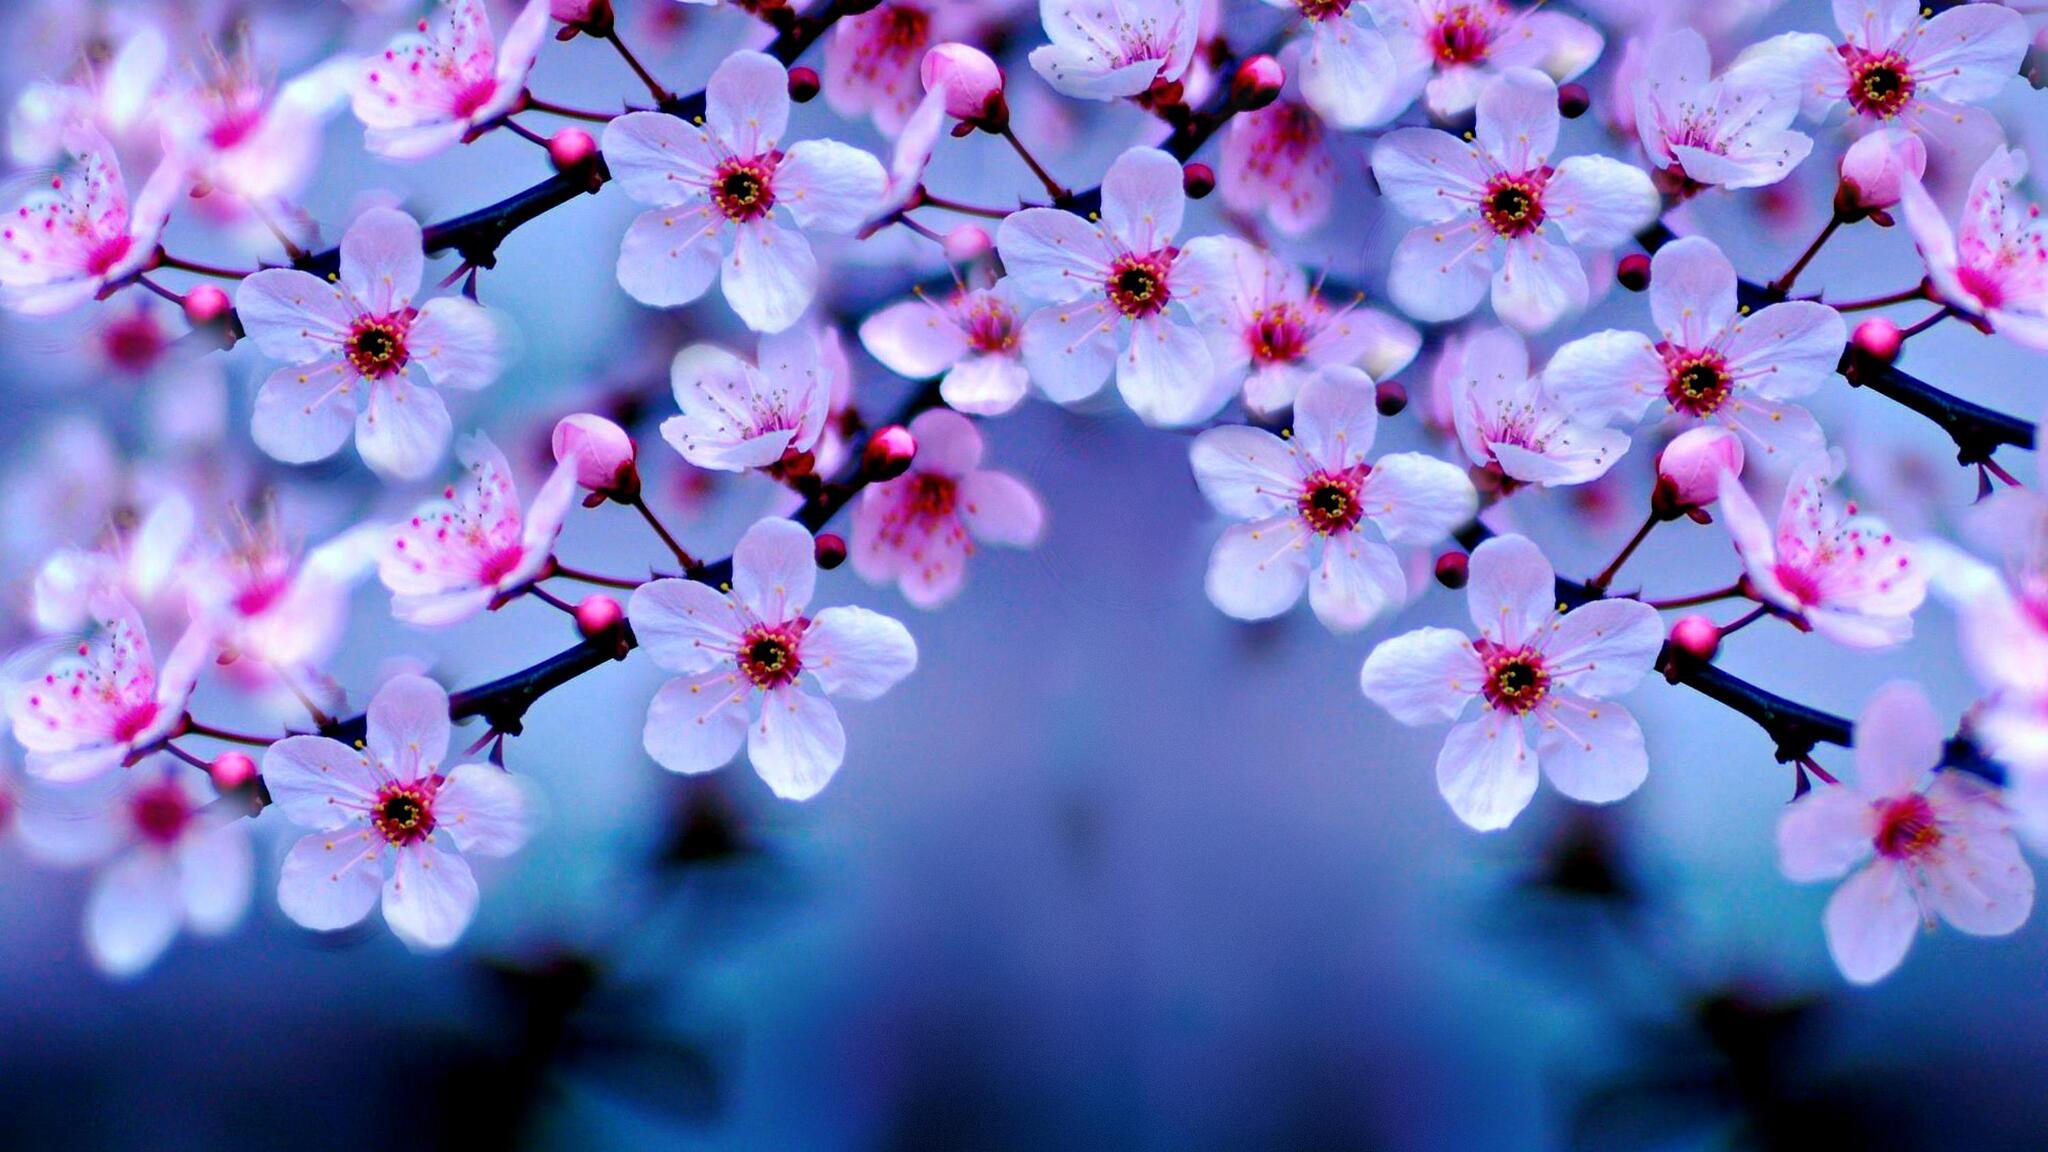 2048x1152 Cherry Blossom 4k 2048x1152 Resolution Hd 4k Wallpapers